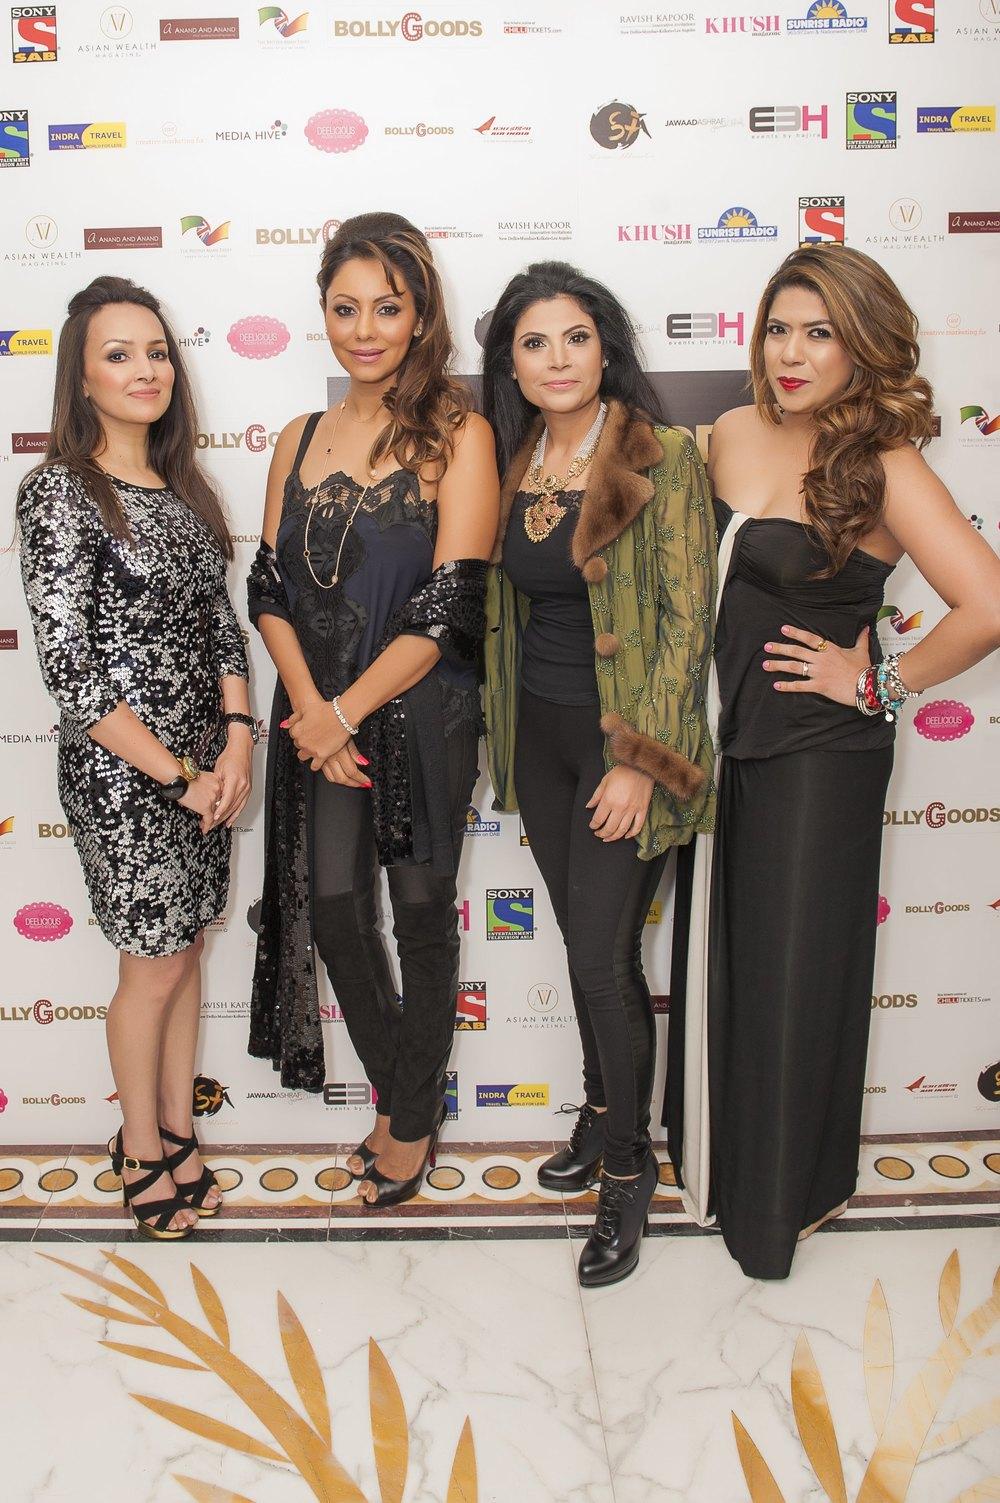 Promila Jain Bahri; Gauri Khan; Shivani Ahluwalia; Monica Sambharya Parikh, Co-CEO & Director, Trescent Lifestyles at BollyGoods Edition 2, London (photographer credit - Shahid Malik).jpg